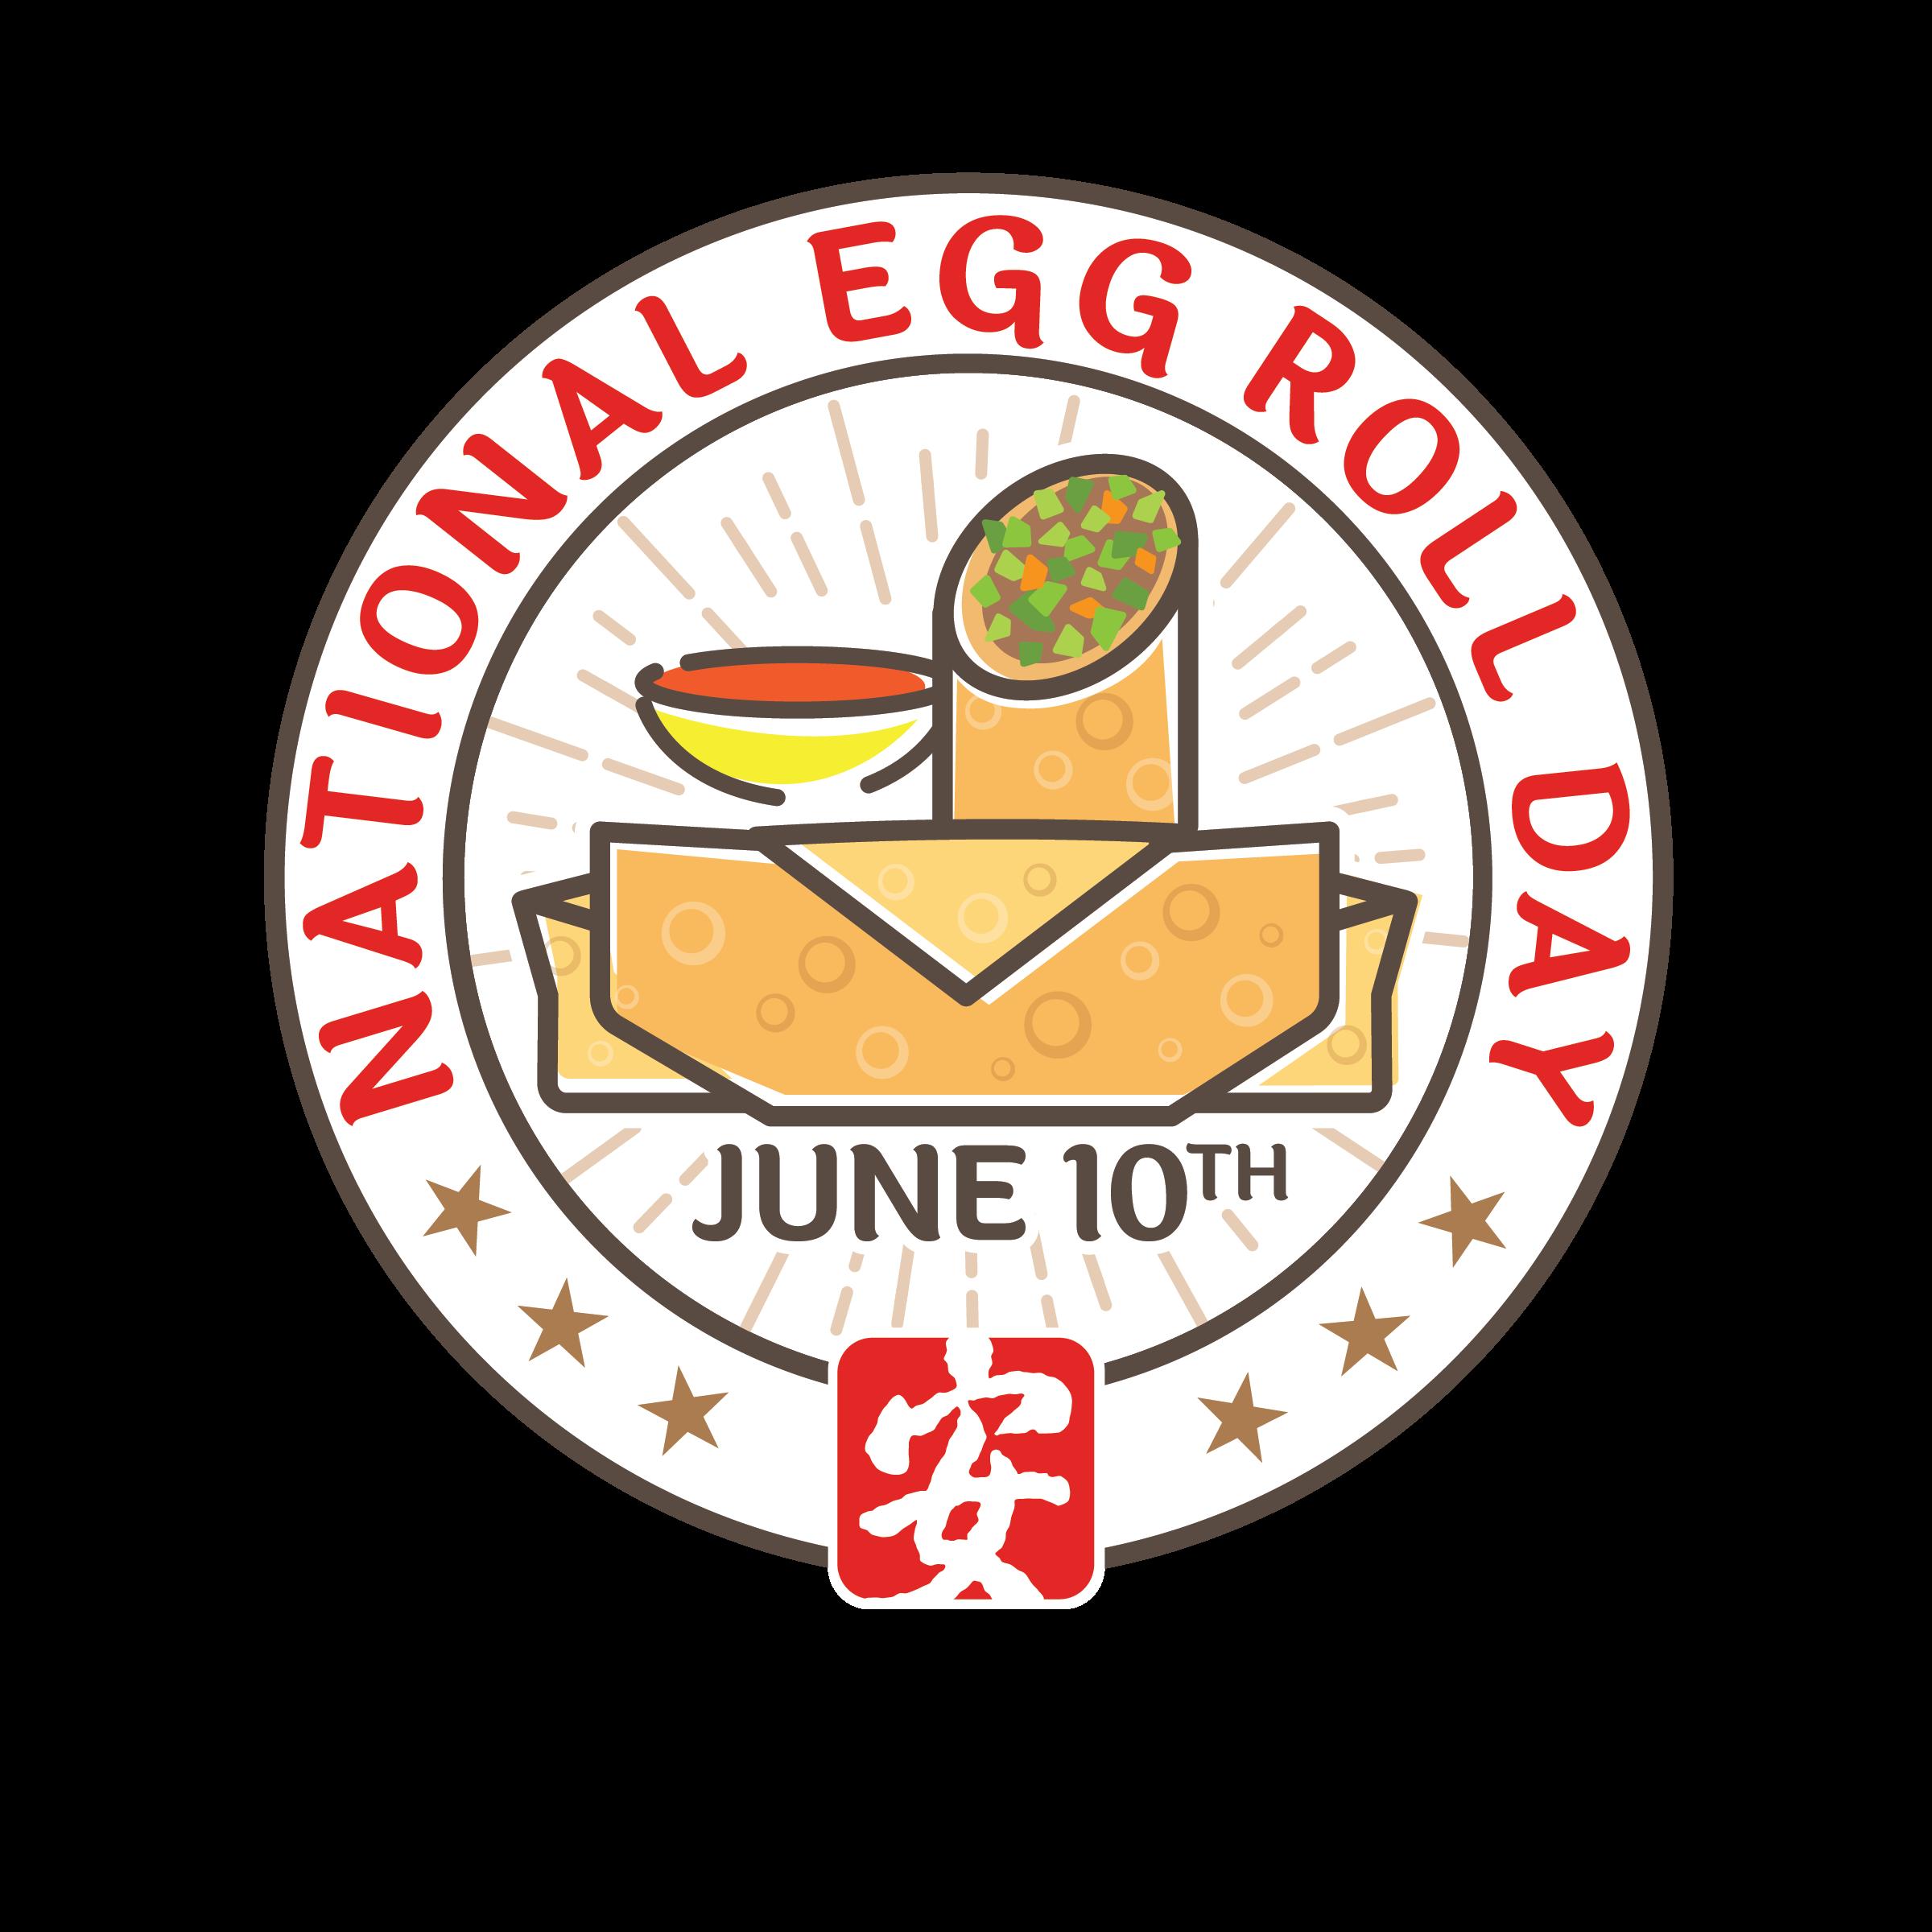 National Egg Roll Day